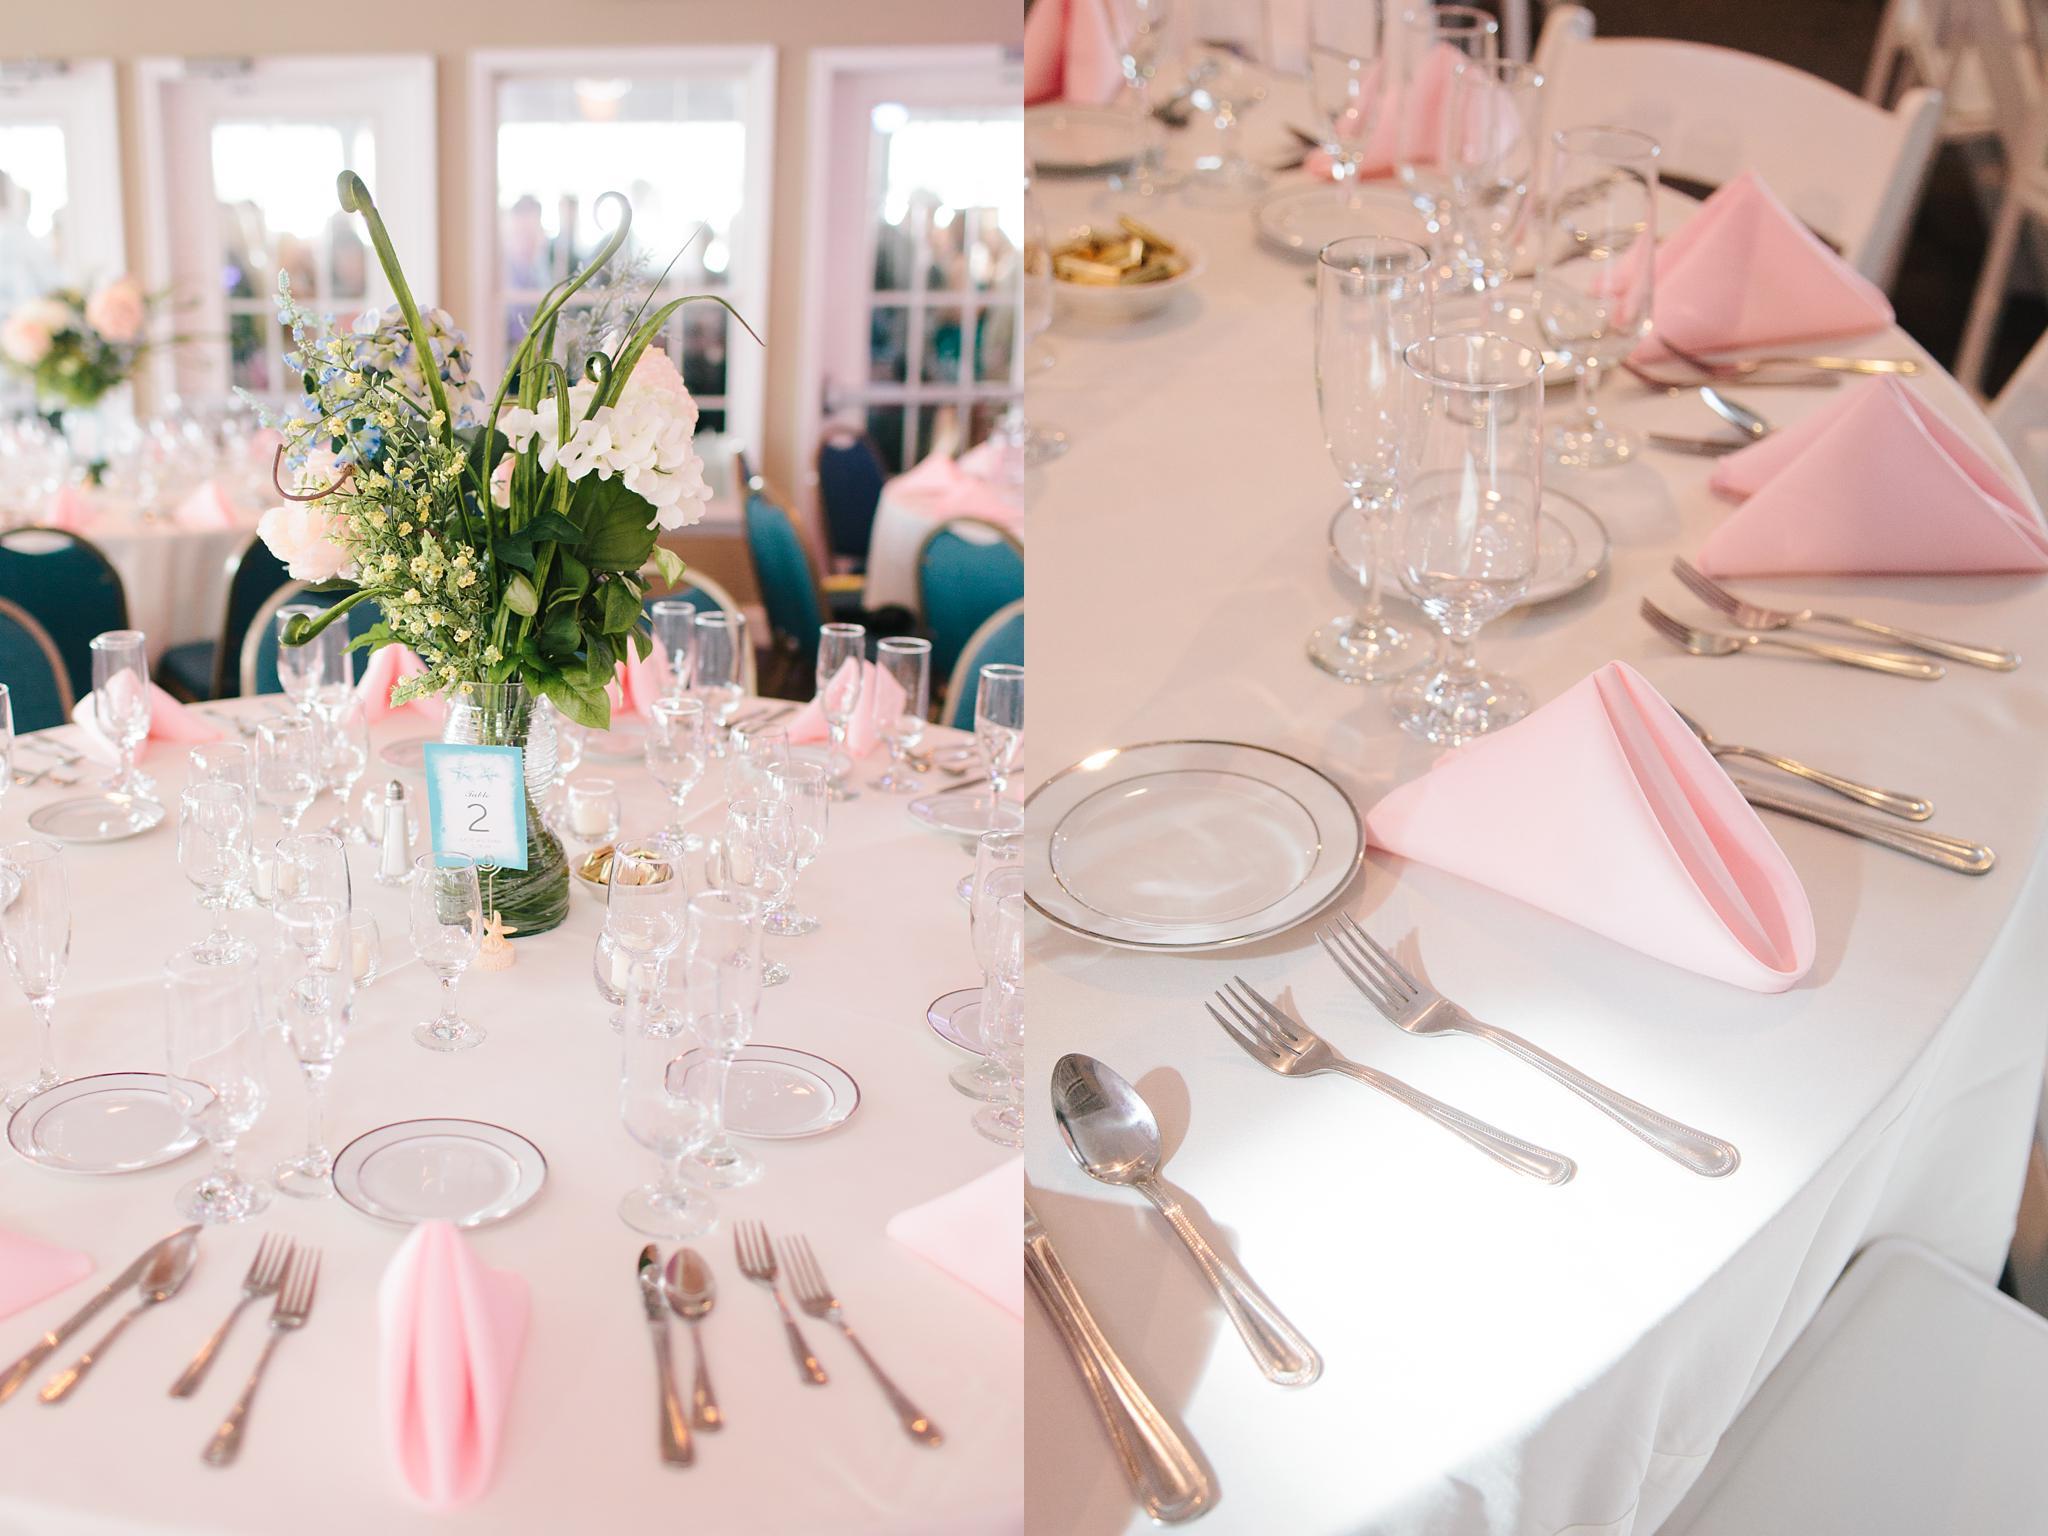 brant_beach_yacht_club_wedding_long_beach_island_nj_wedding_photographer_599-2.jpg